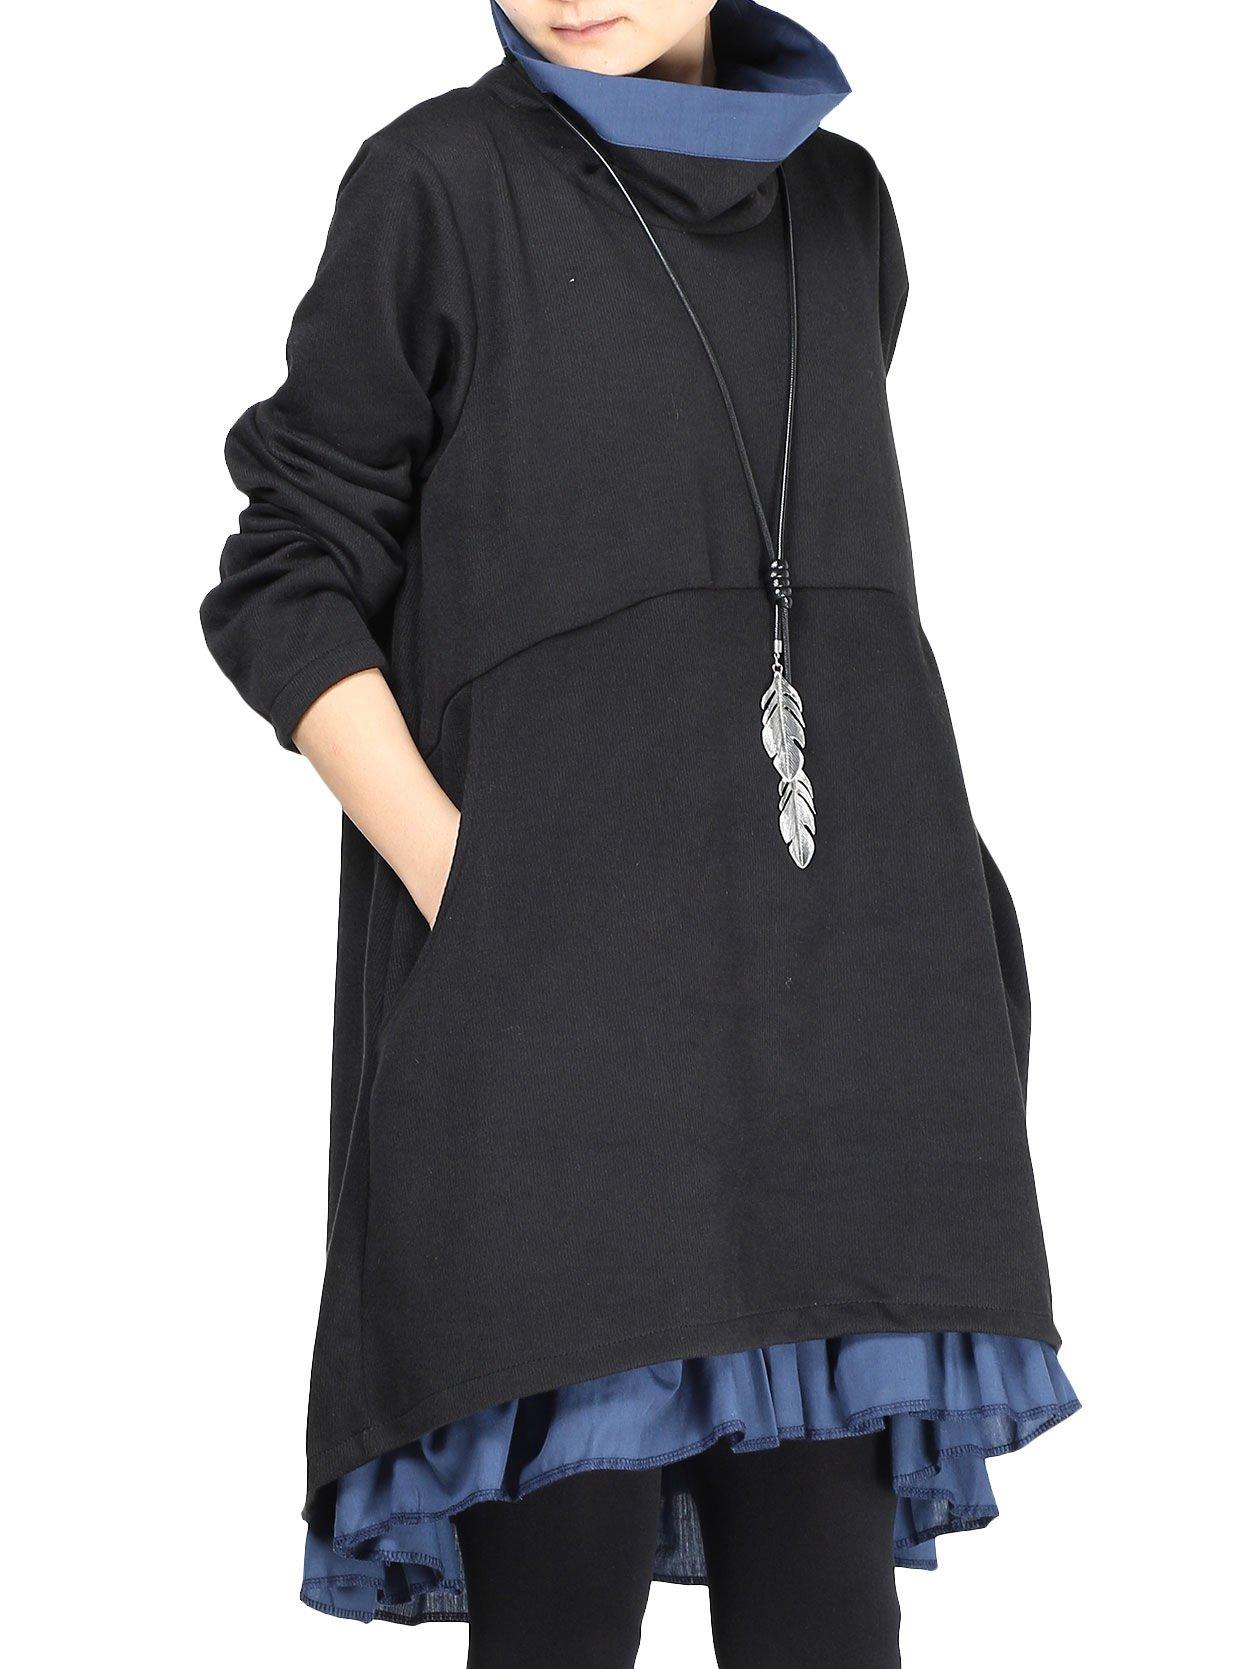 Mordenmiss Women's New Turtle Neckline Two Layers Hi-low Hem Dress L Black